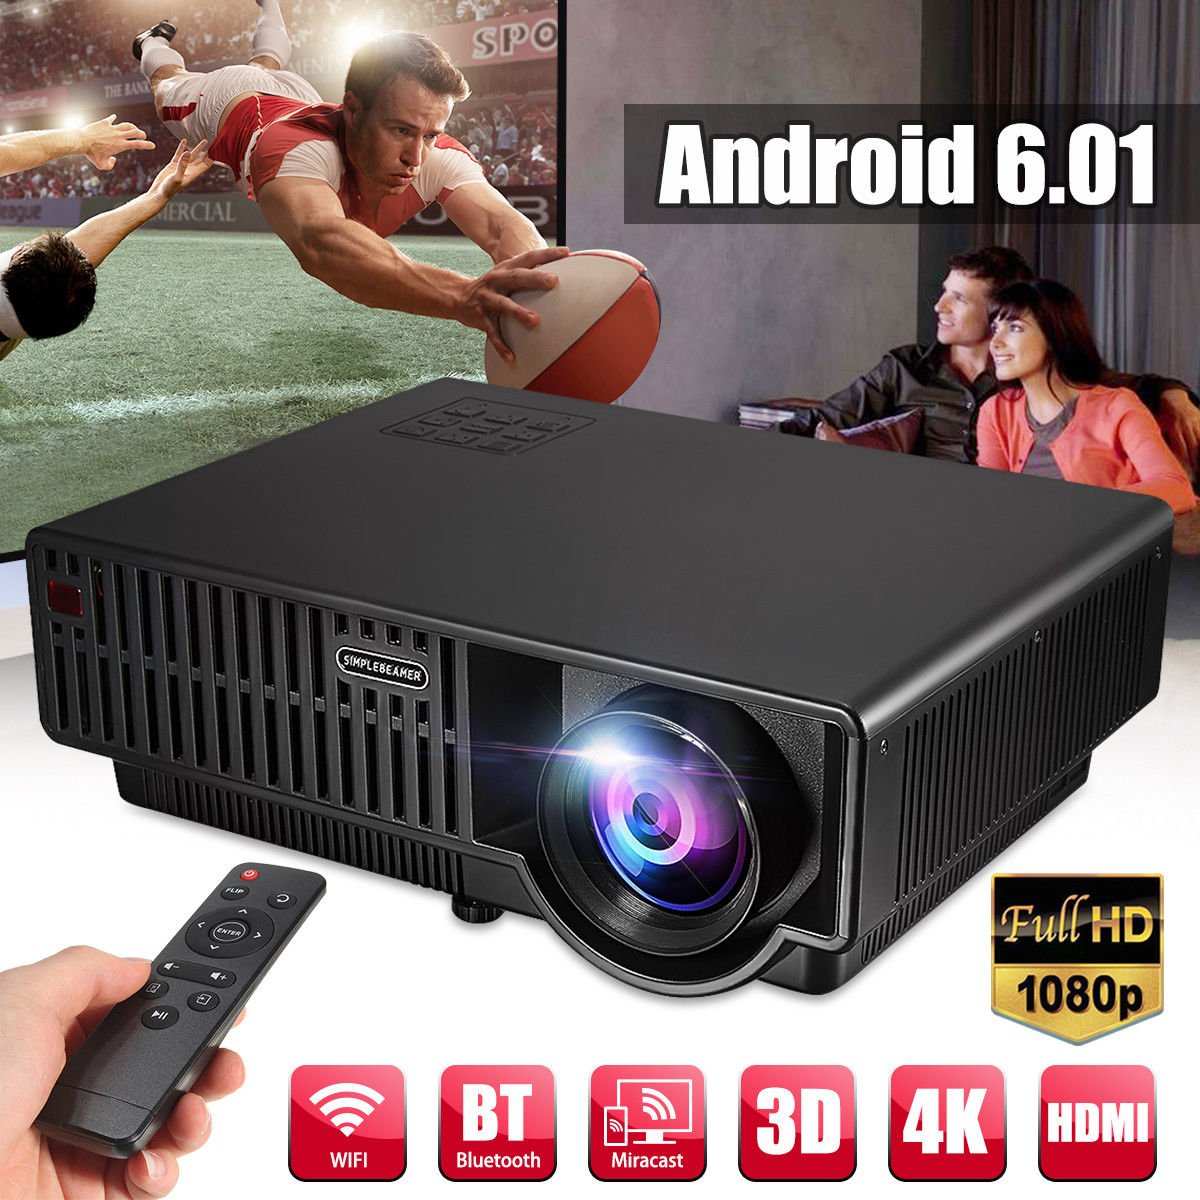 FUT(エフュ ト) 3500ルーメン 3D LED プロジェクター 4K アンドロイド6.0 wifi HD対応 ホームシアター HD ビデオ パソコン/スマホ/タブレット/ゲーム 機接続可可能 ホームプロジェクター ブラック B07CZHLJBQ ブラック